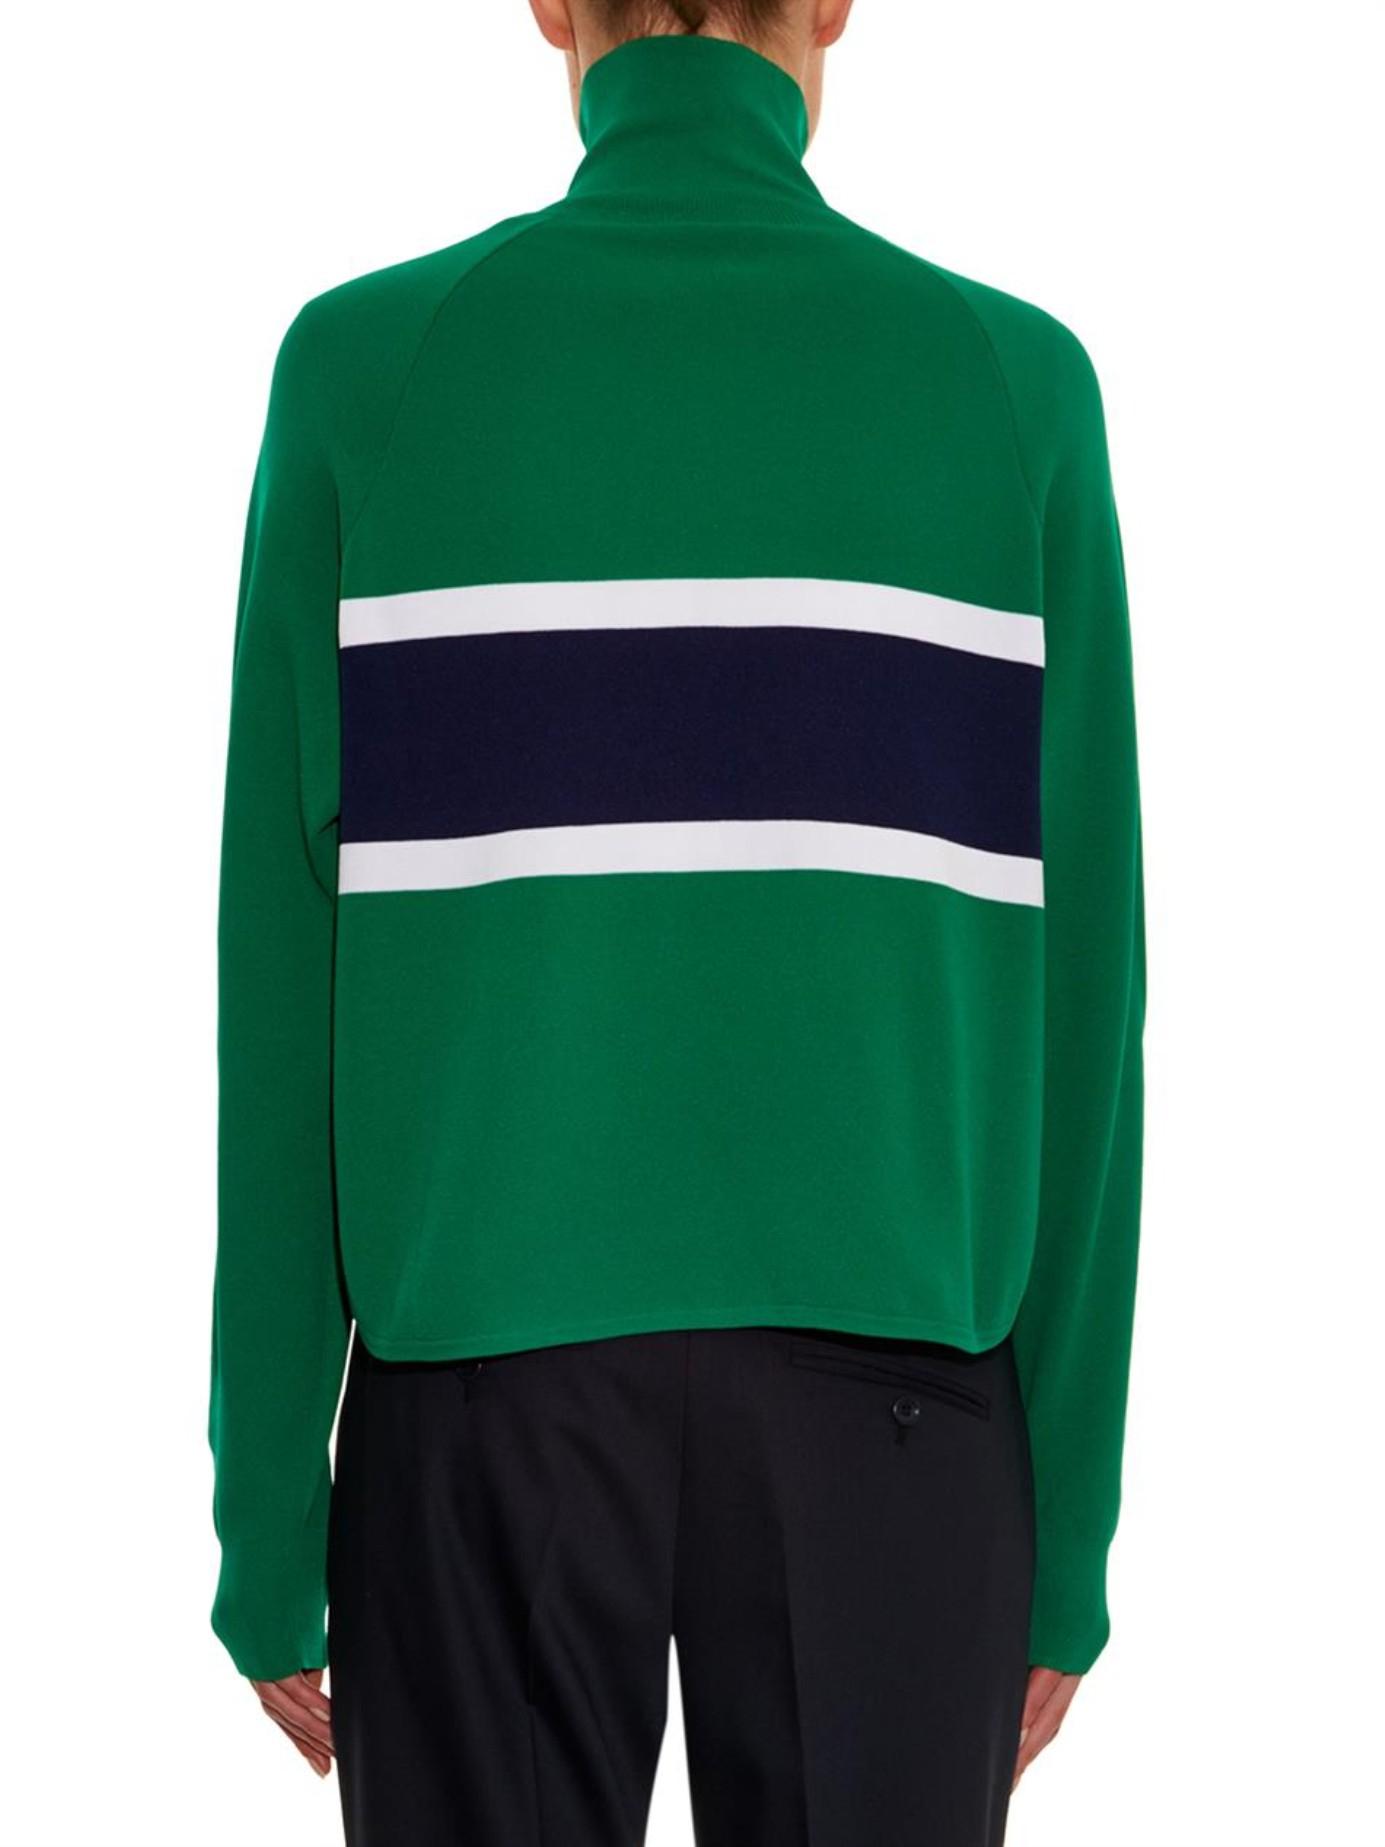 Jil sander navy Striped Knit Cardigan in Green